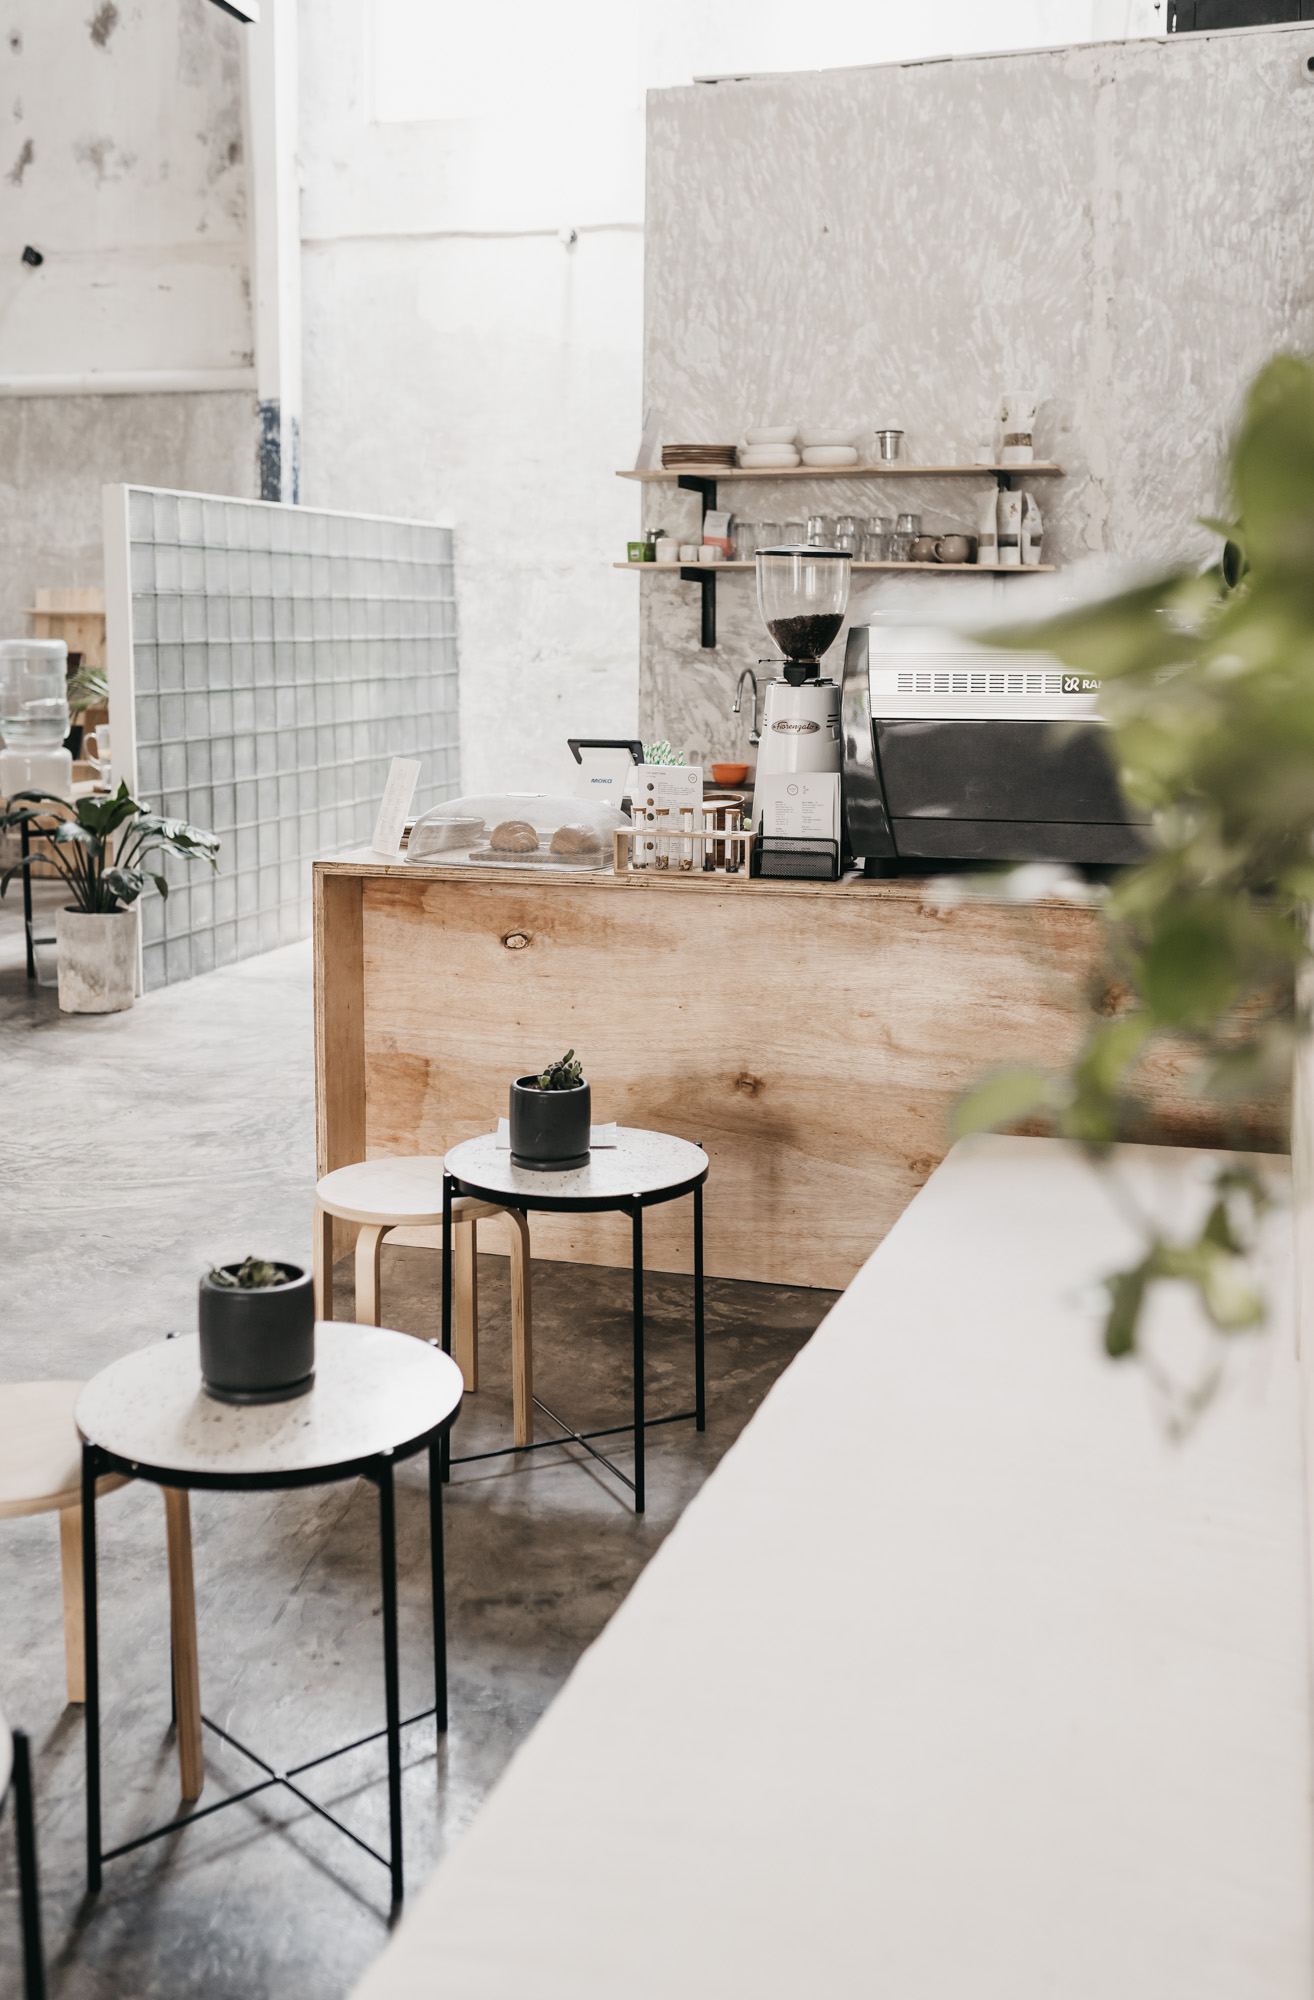 keira-mason-kinship-studio-ruko-cafe-pop-up.jpg